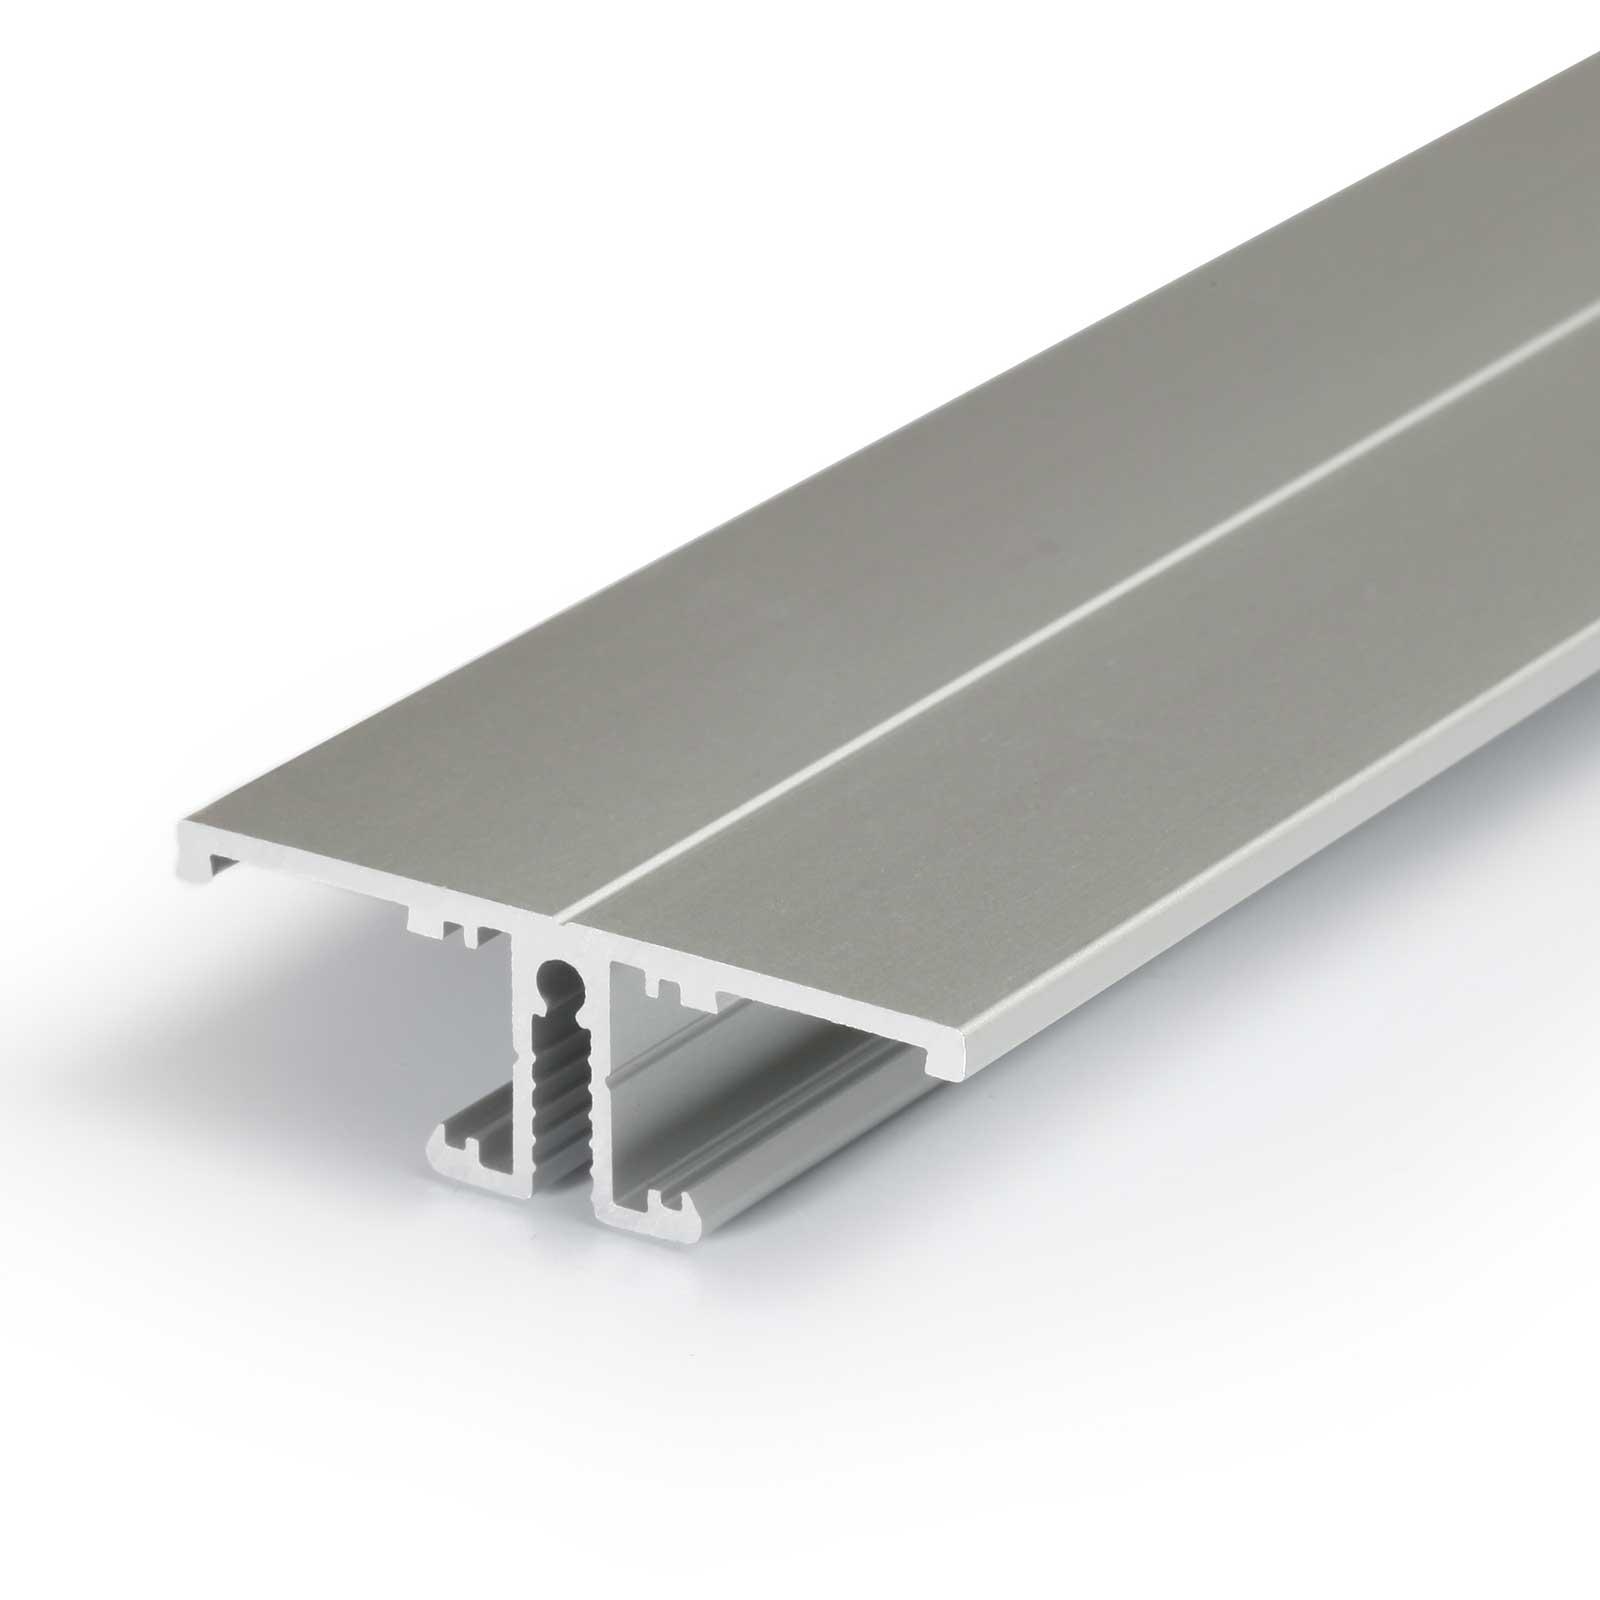 1-2 Meter LED Aufbauprofil BACK (BA)